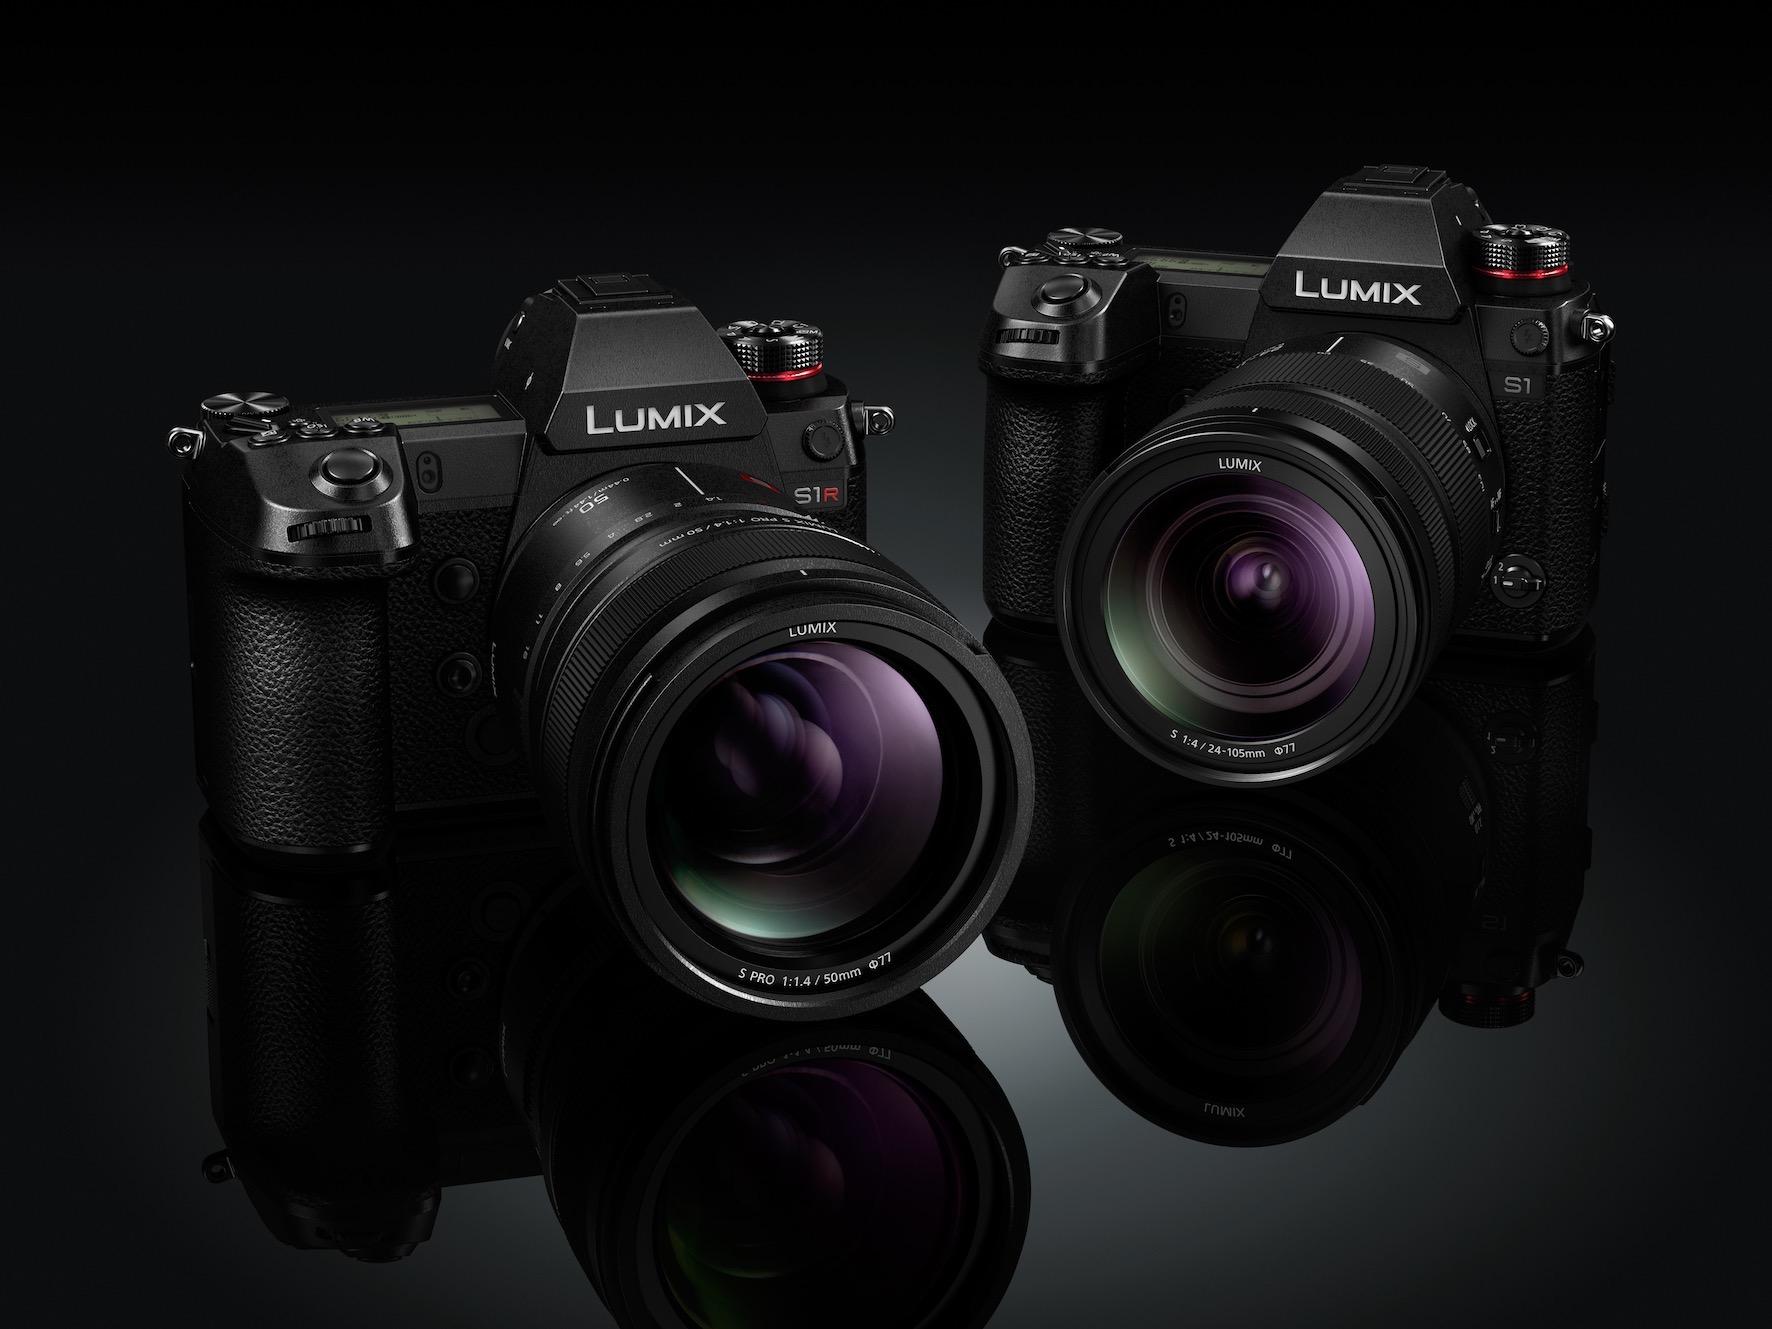 067-FY2018-Panasonic-LUMIX-S-Serie-1.jpg